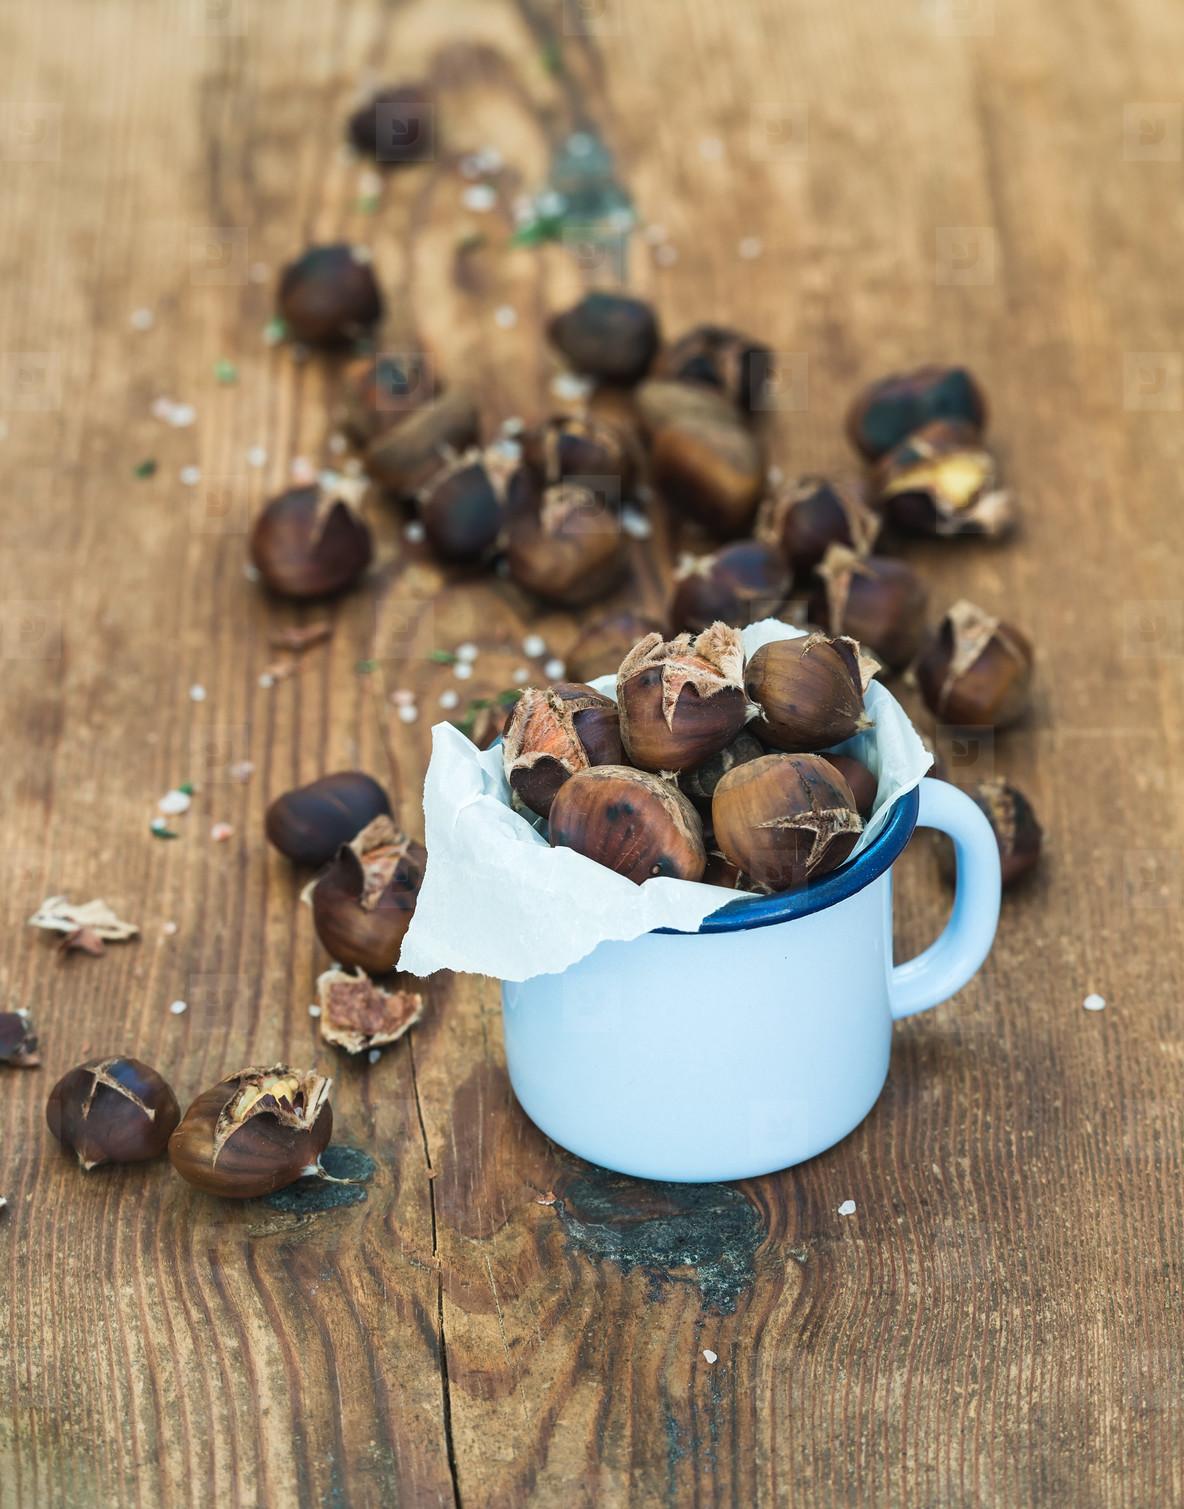 Roasted chestnuts in blue enamel mug on rustic wooden background  selective focus